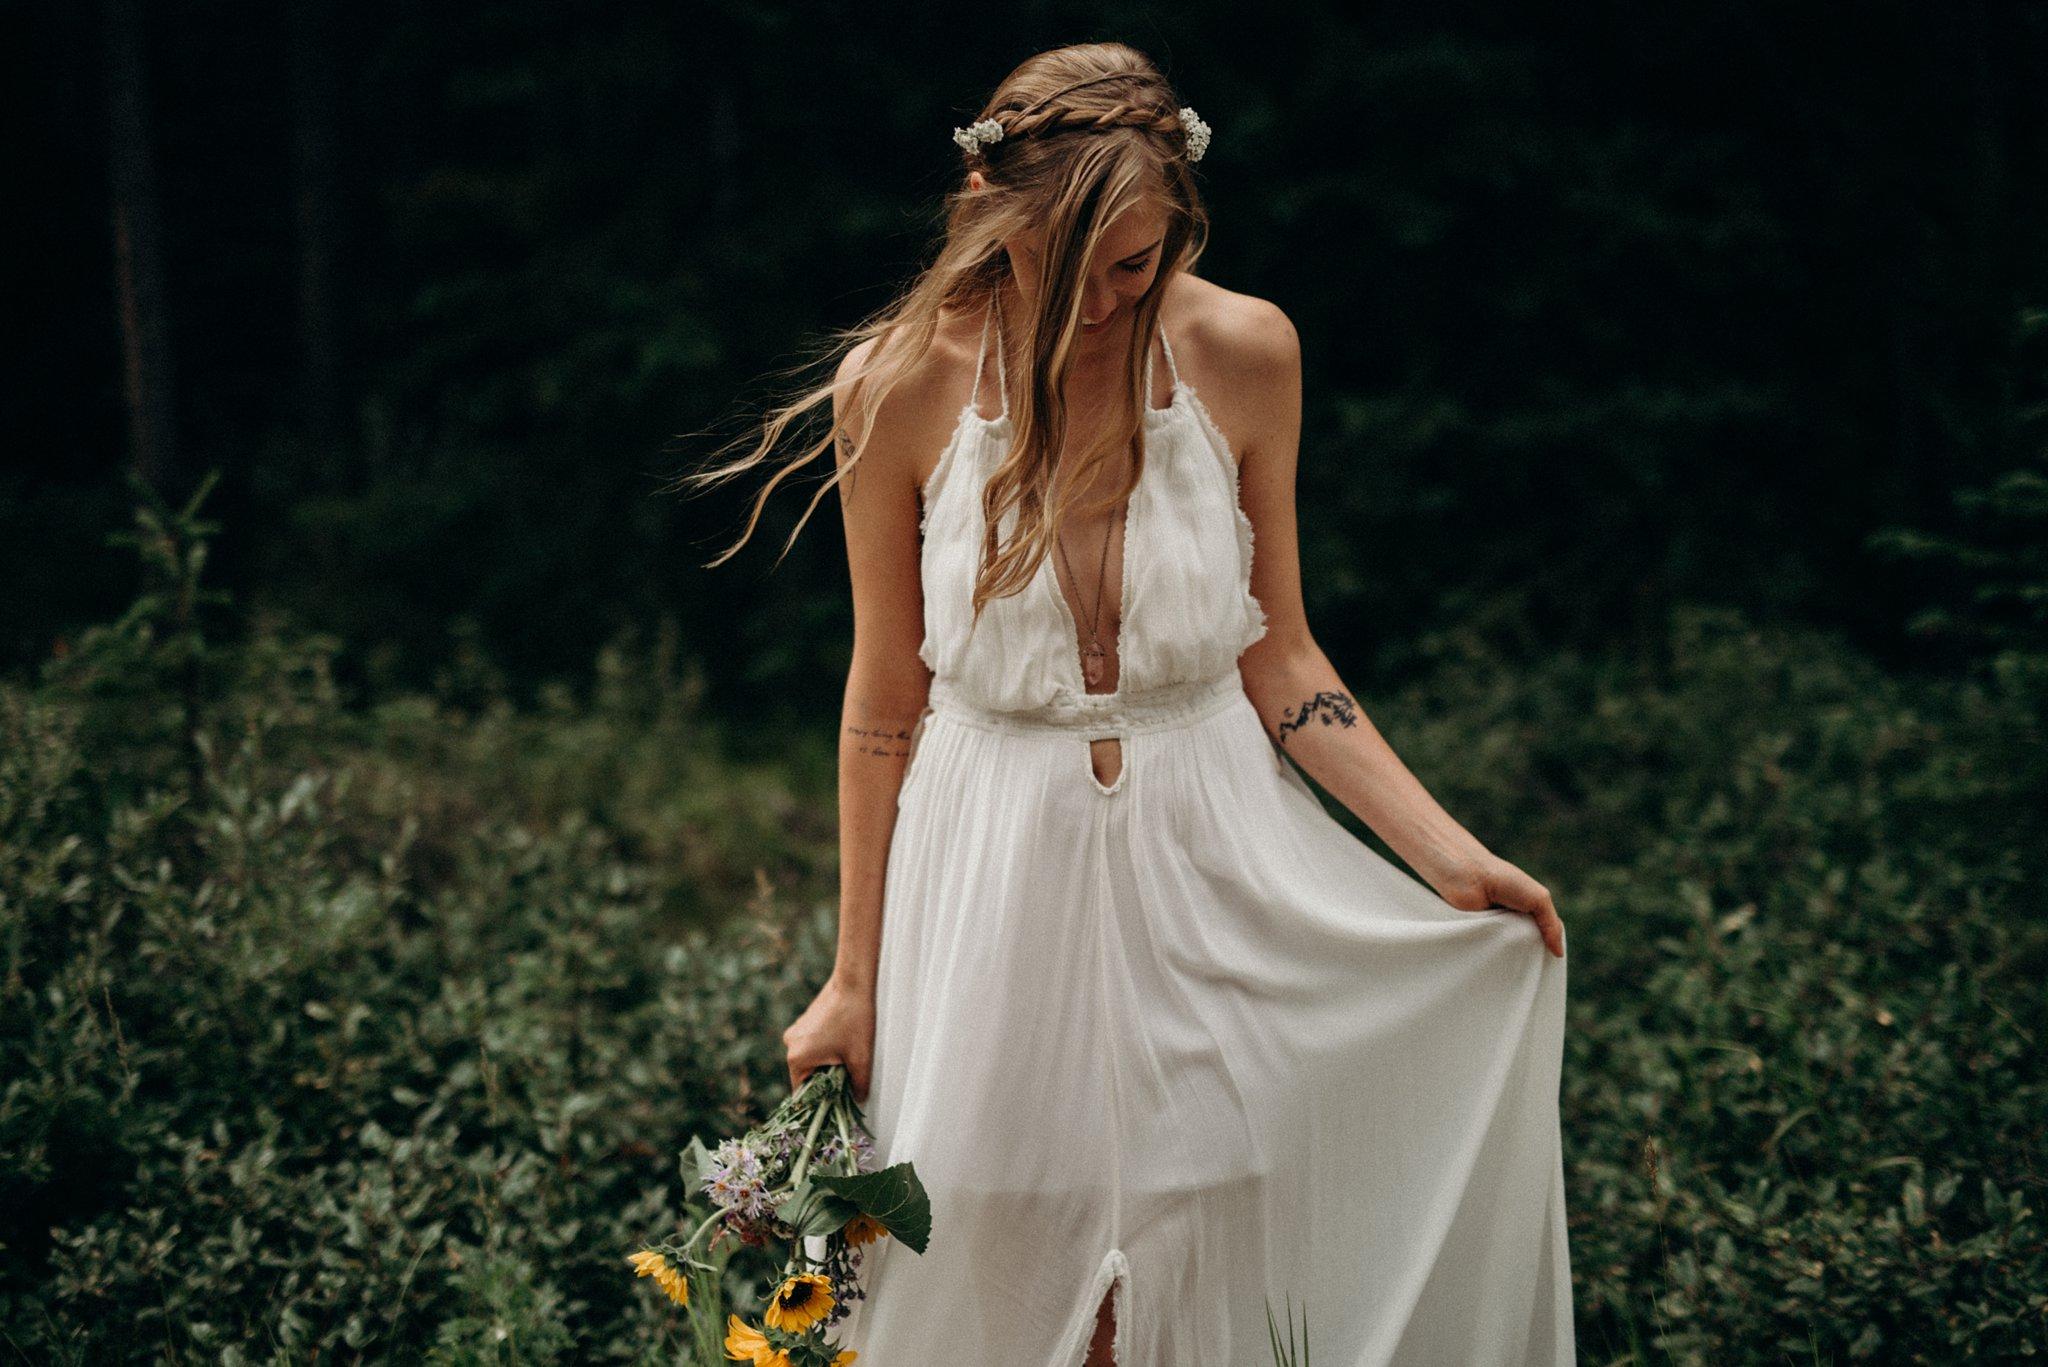 kaihla_tonai_intimate_wedding_elopement_photographer_6369.jpg